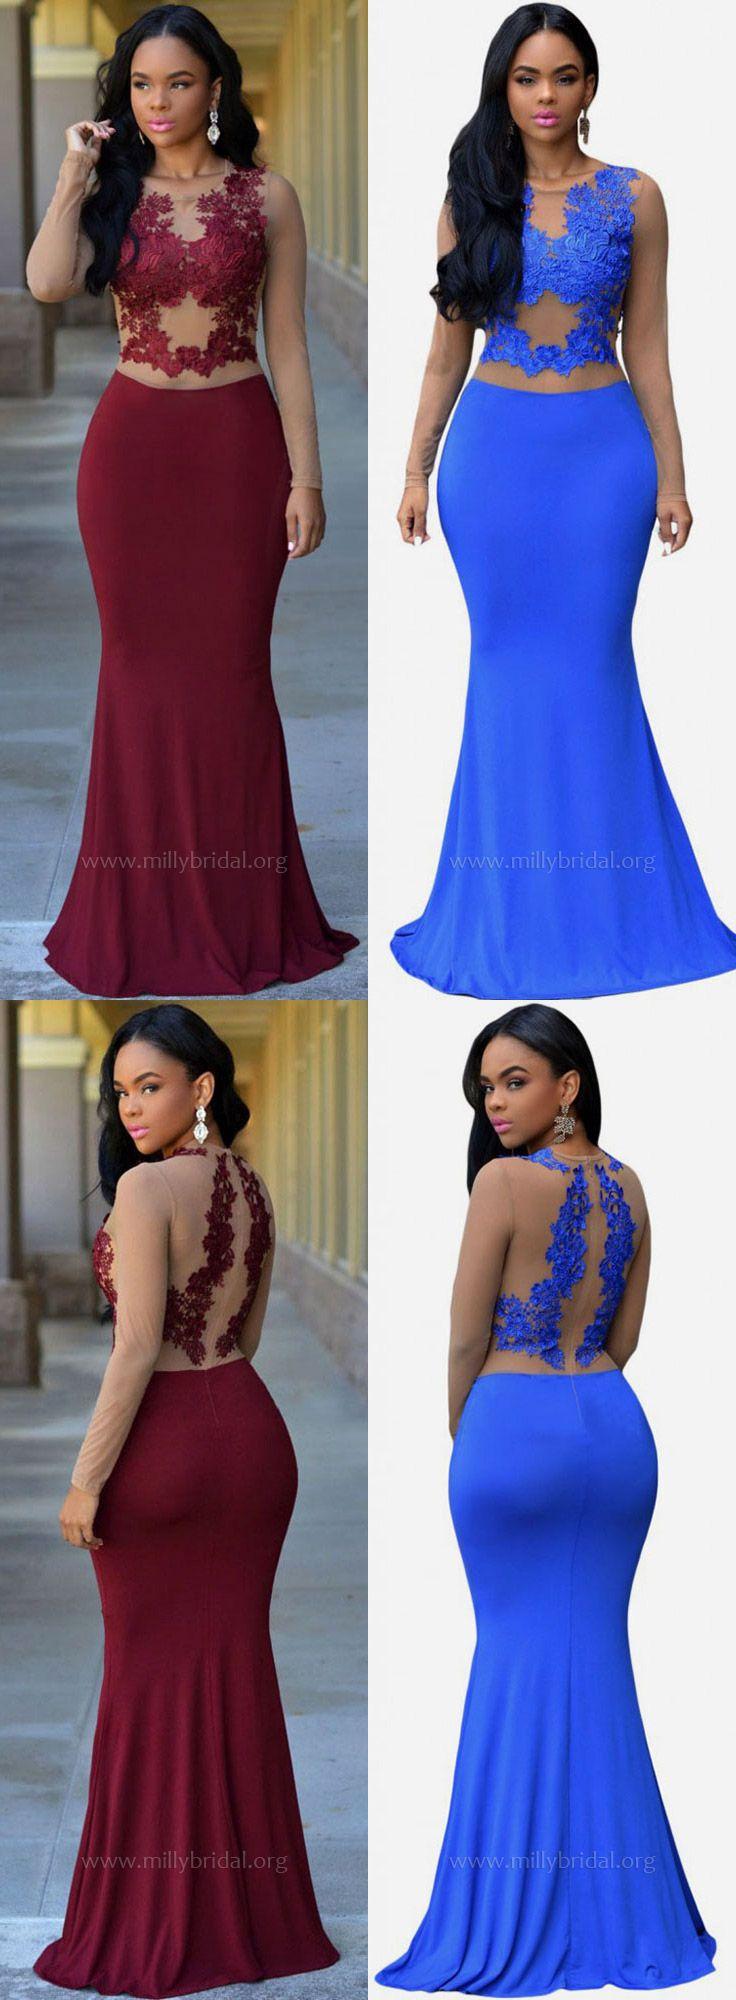 Prom dresses long formal dresses mermaidlong sleeves evening